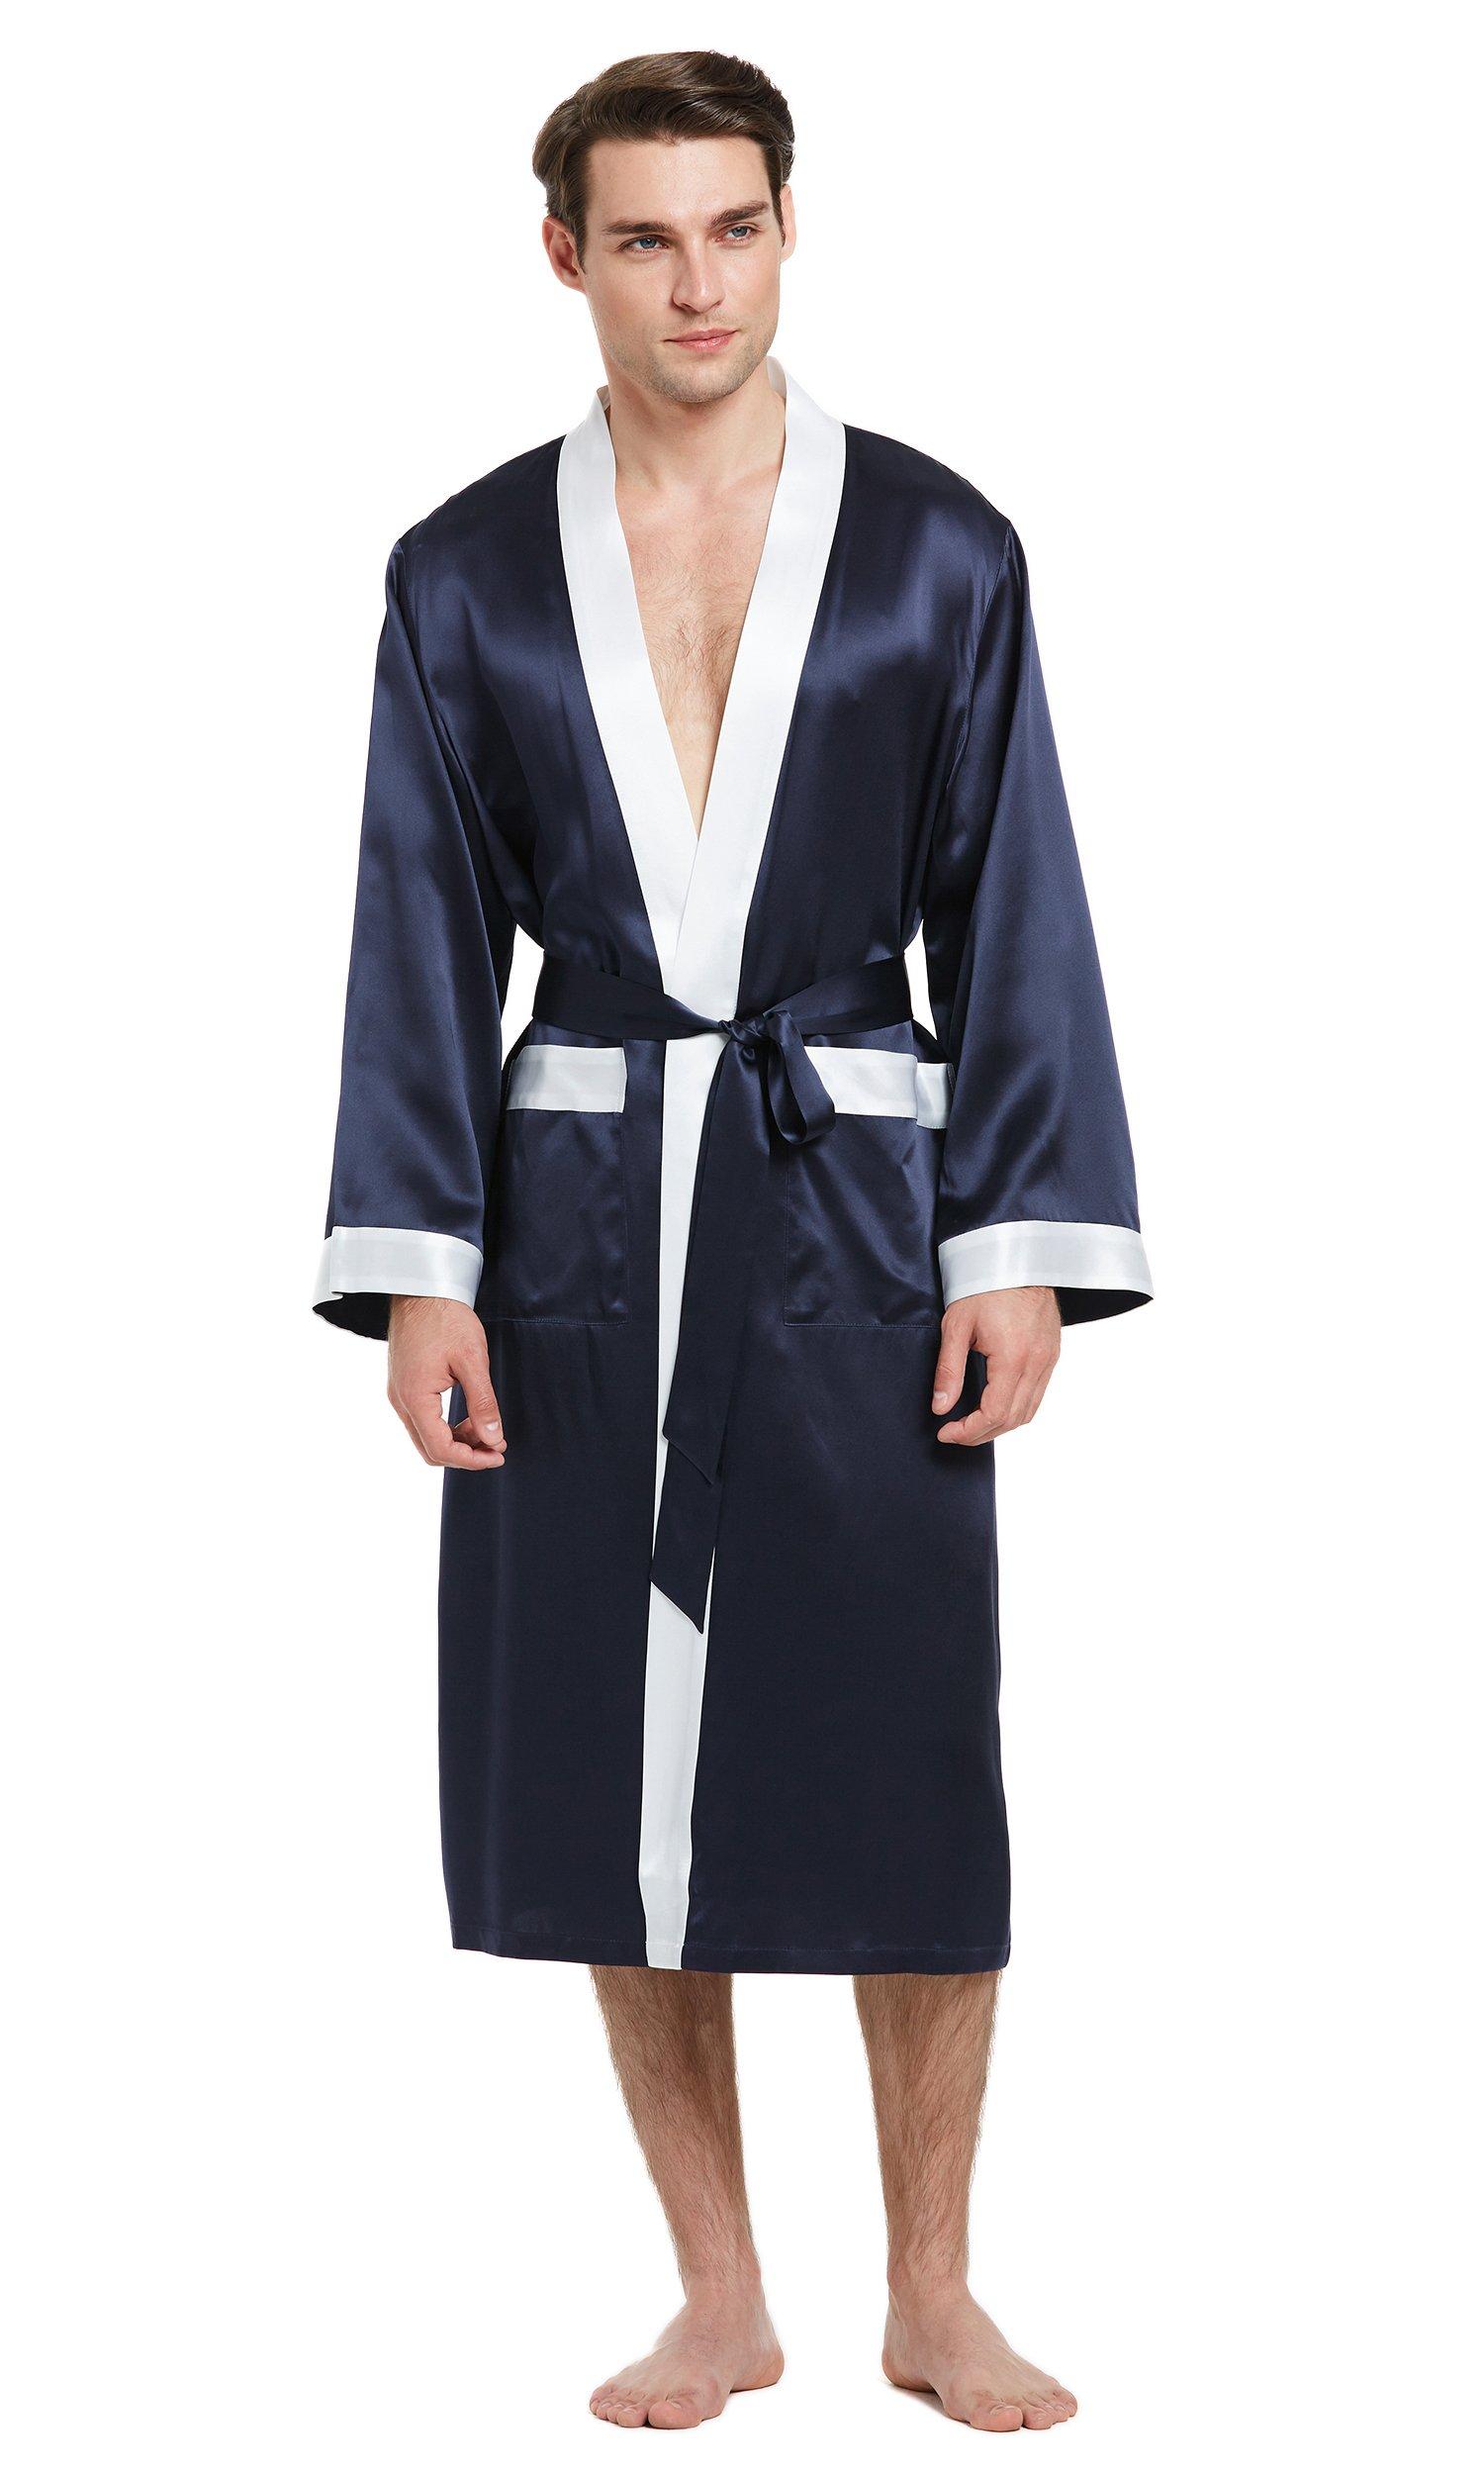 LilySilk Mens Silk Robes 100 Pure Mulberry Long Japanese Kimono Style Sleepwear Luxury Contrast Color Loungewear Navy Blue XL/42